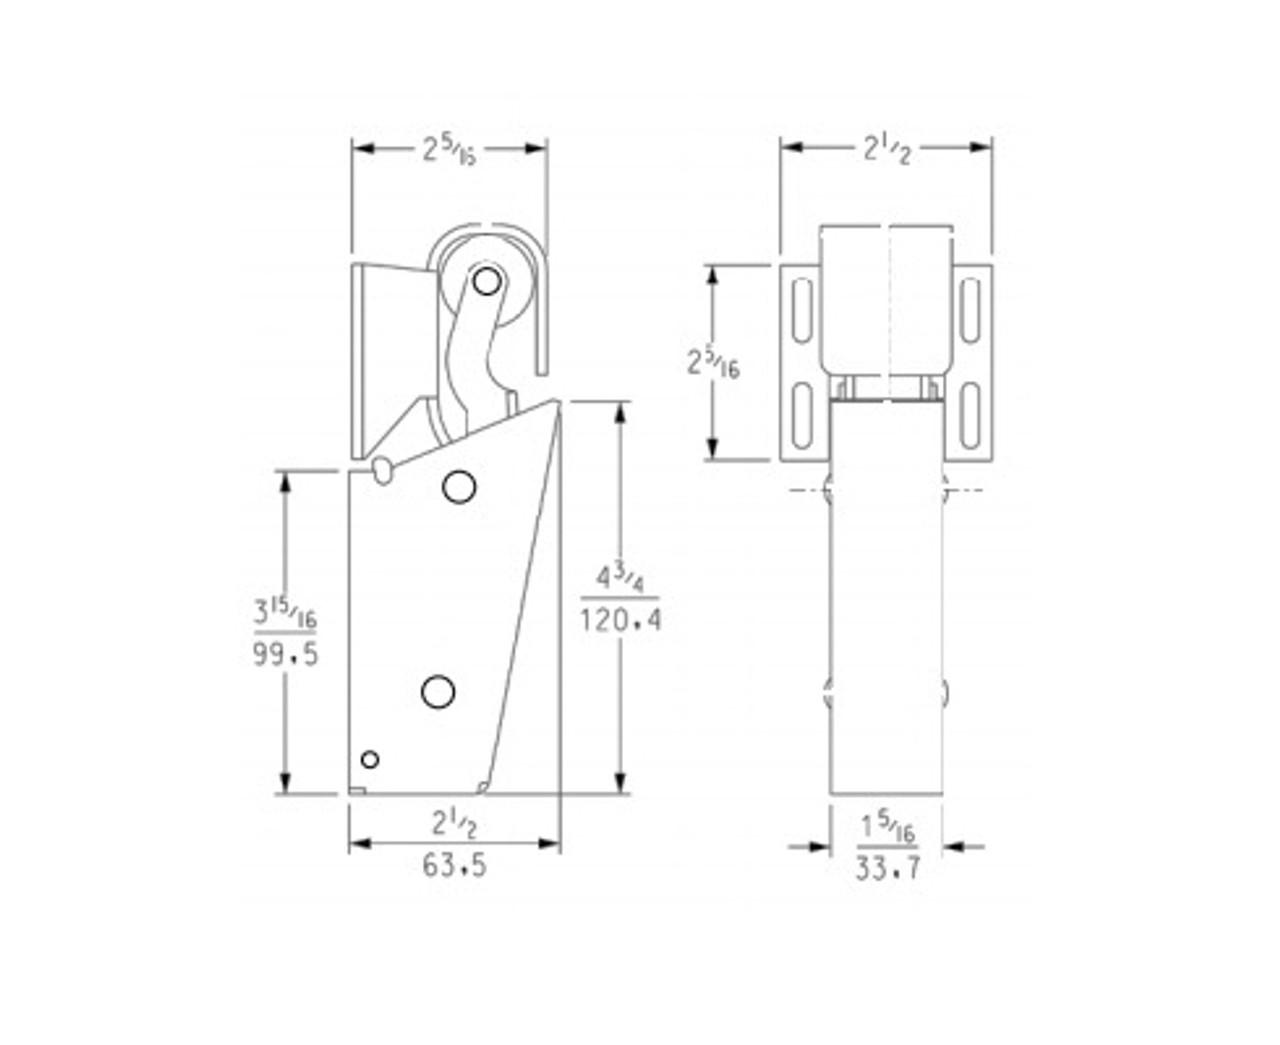 Kason-1095-door-closer-and-hook-11095000013-11094000027-11094000026-dimensions